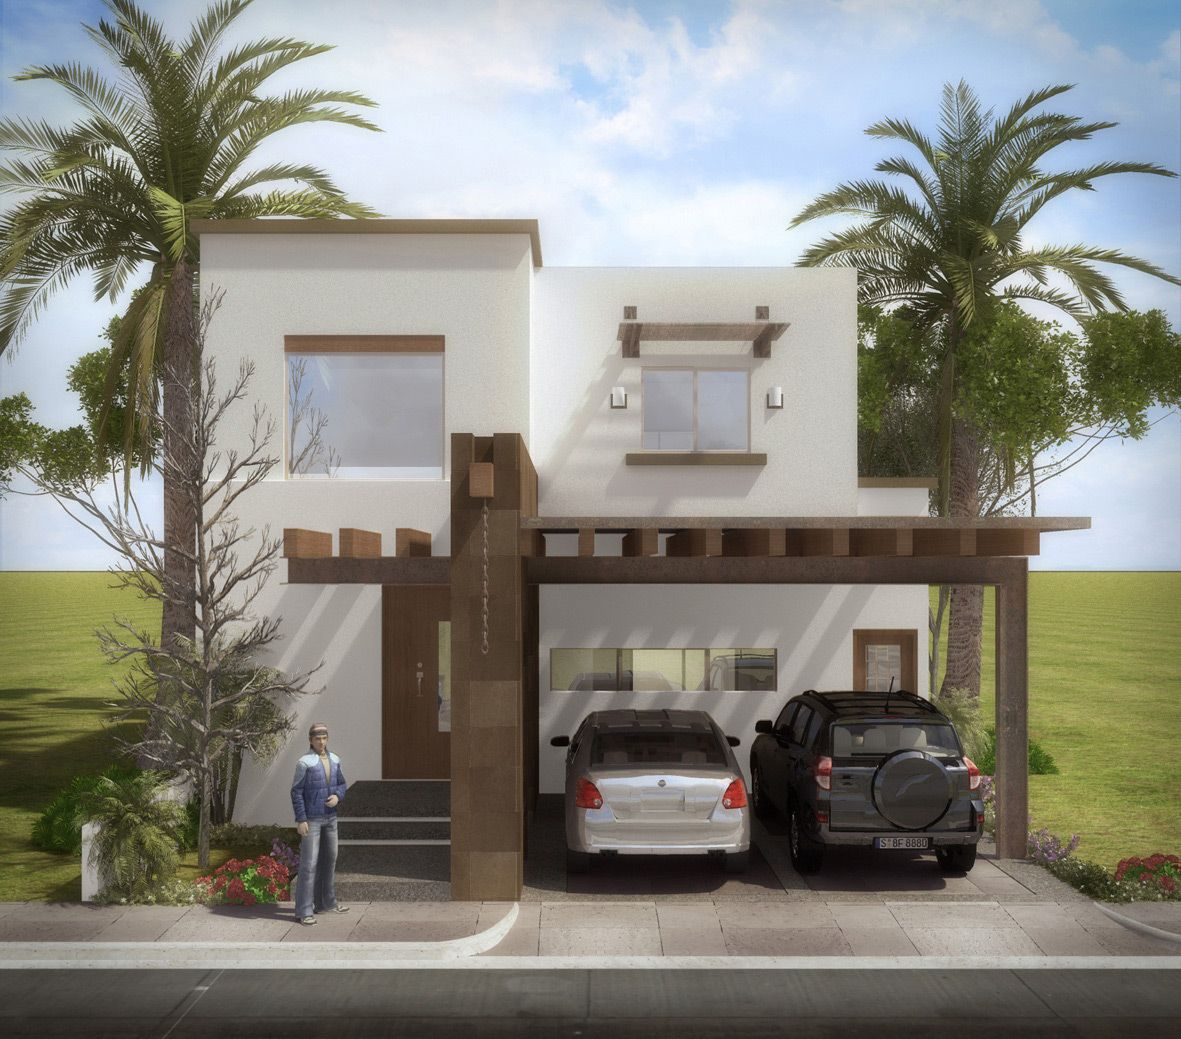 Fotos de fachadas de casas modernas e bonitas for Casas modernas imagenes y planos